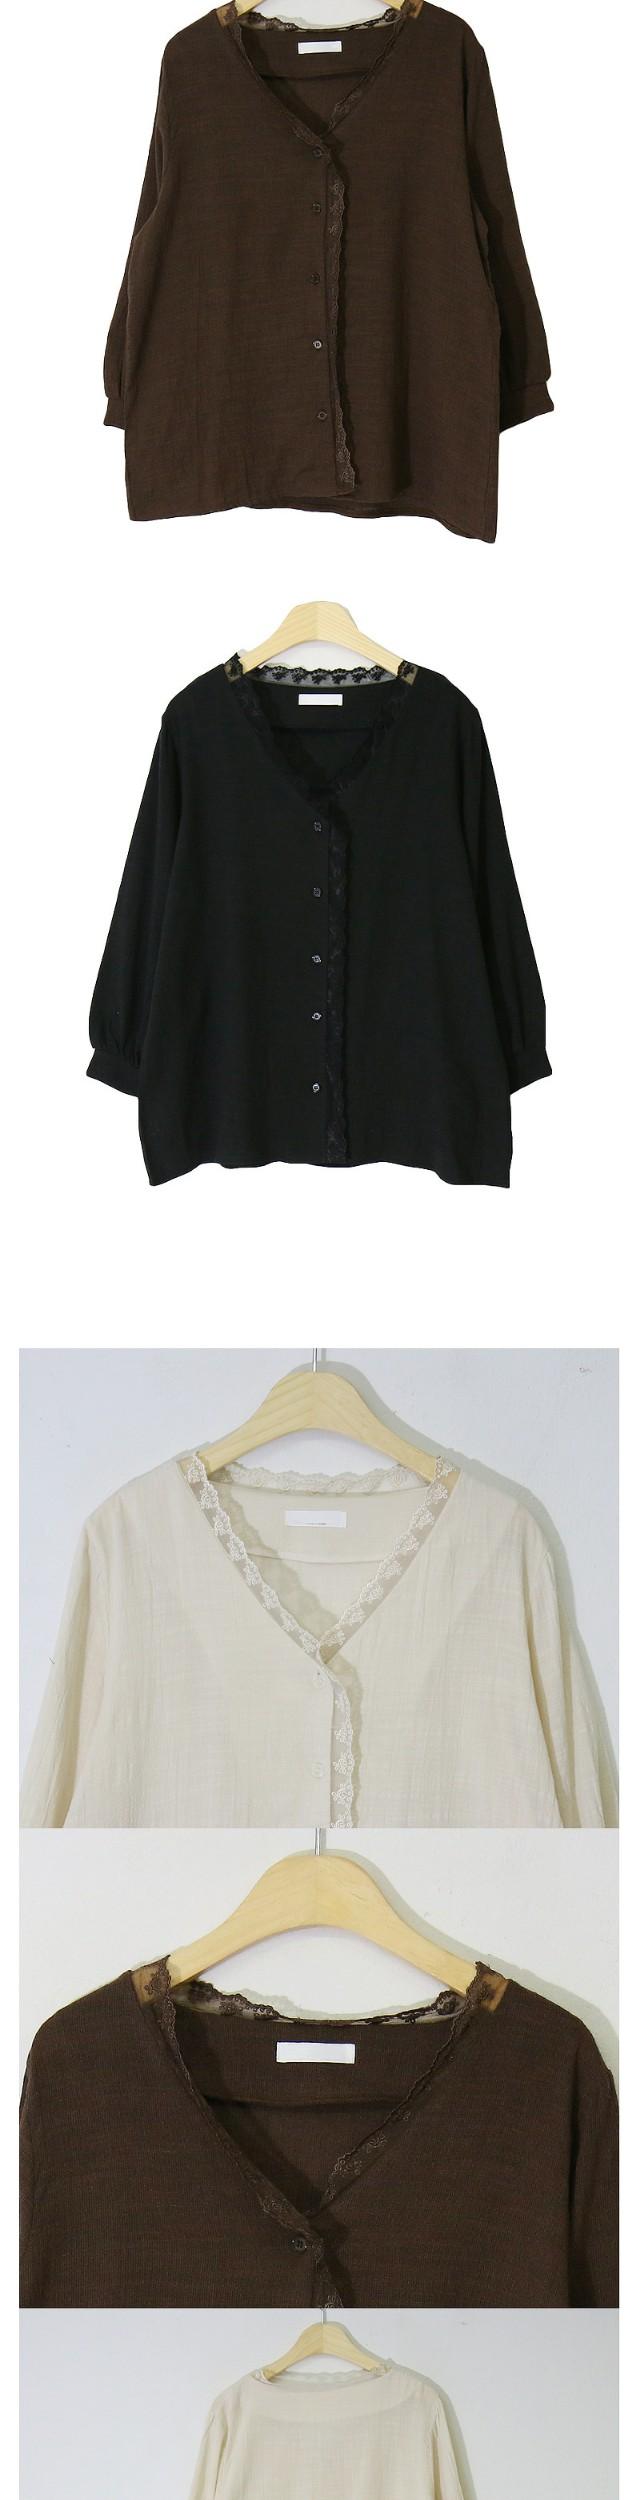 Loving lace blouse